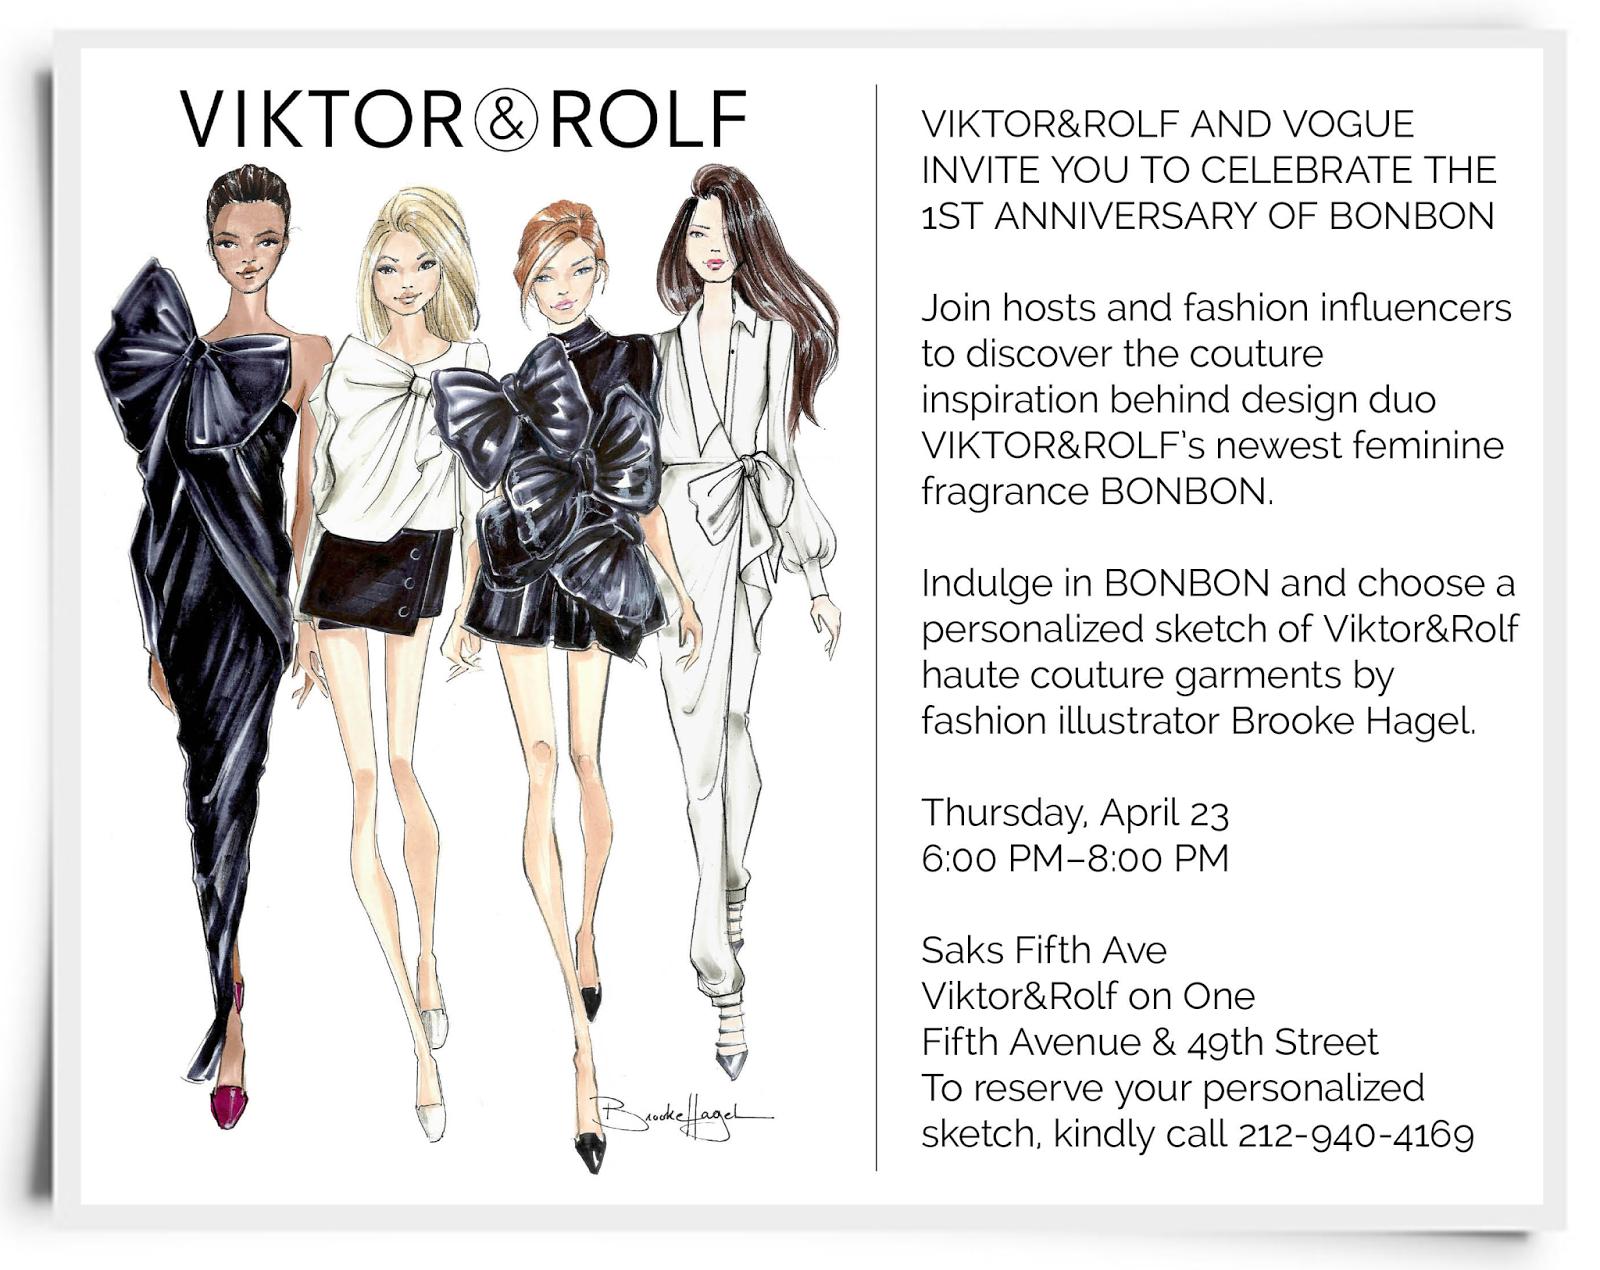 Fabulous Doodles Fashion Illustration Blog By Brooke Hagel Vogue And Viktor Rolf You Re Invited